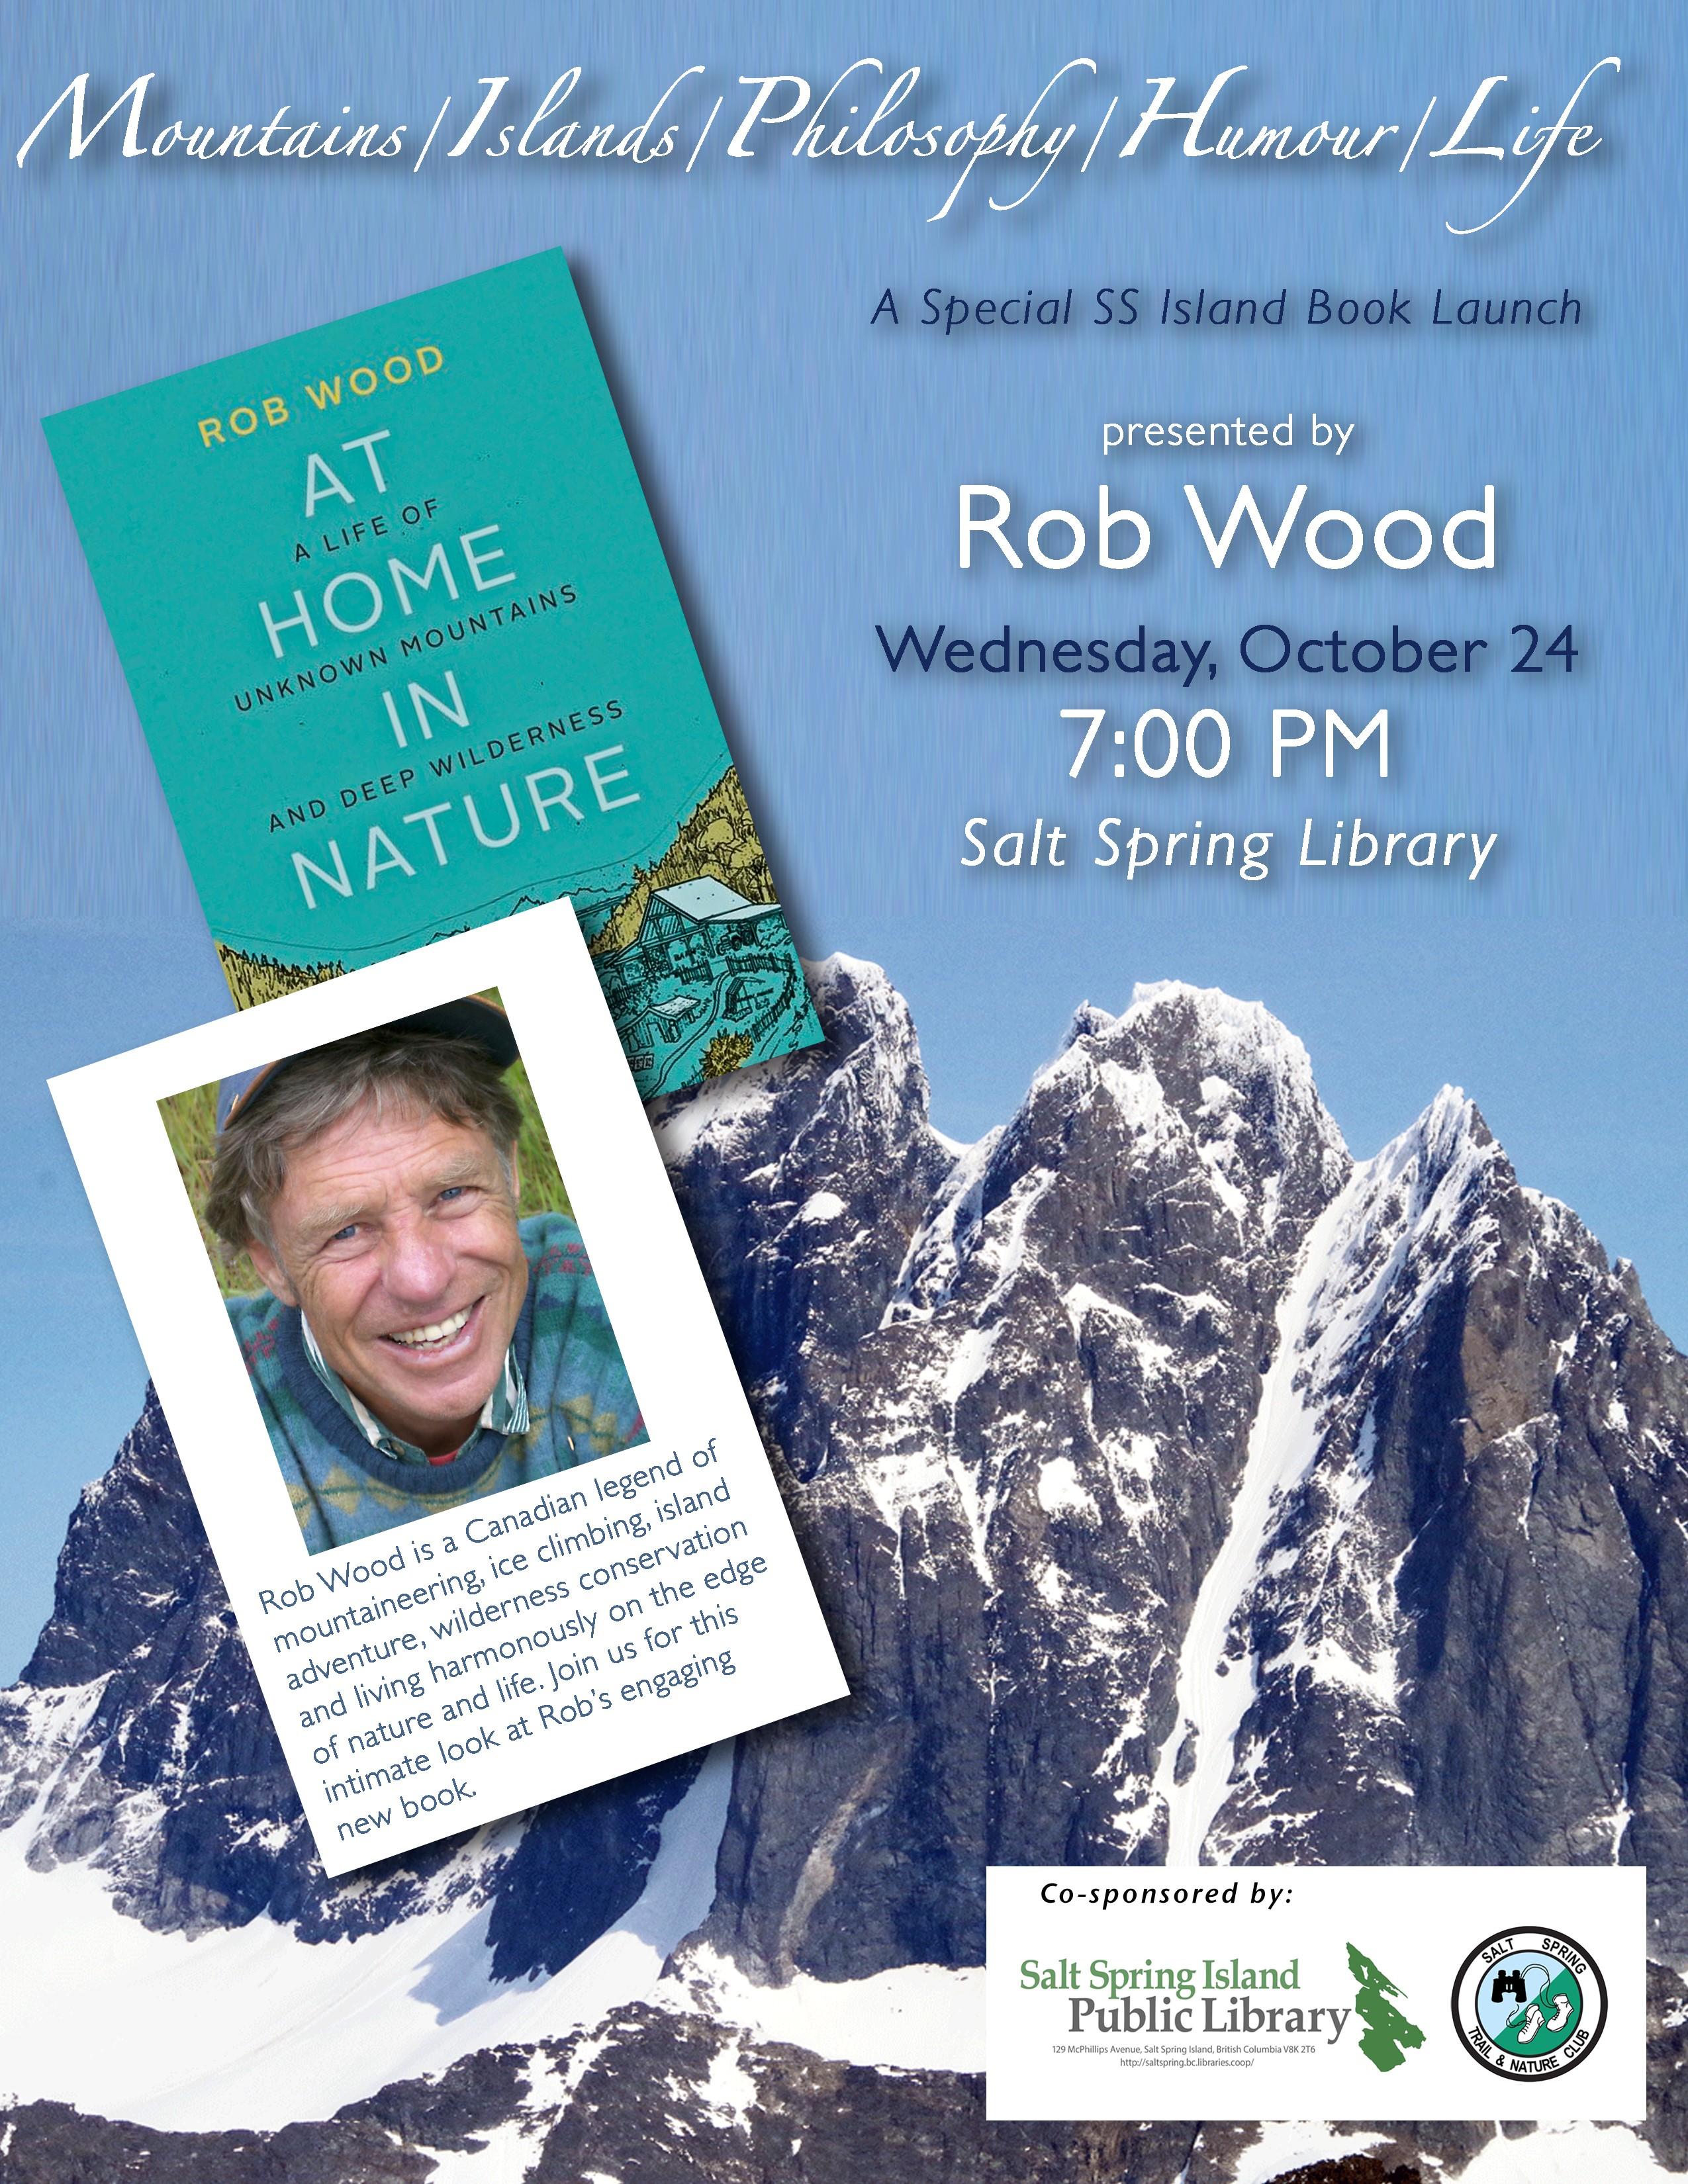 Rob Wood @ Community Program Room